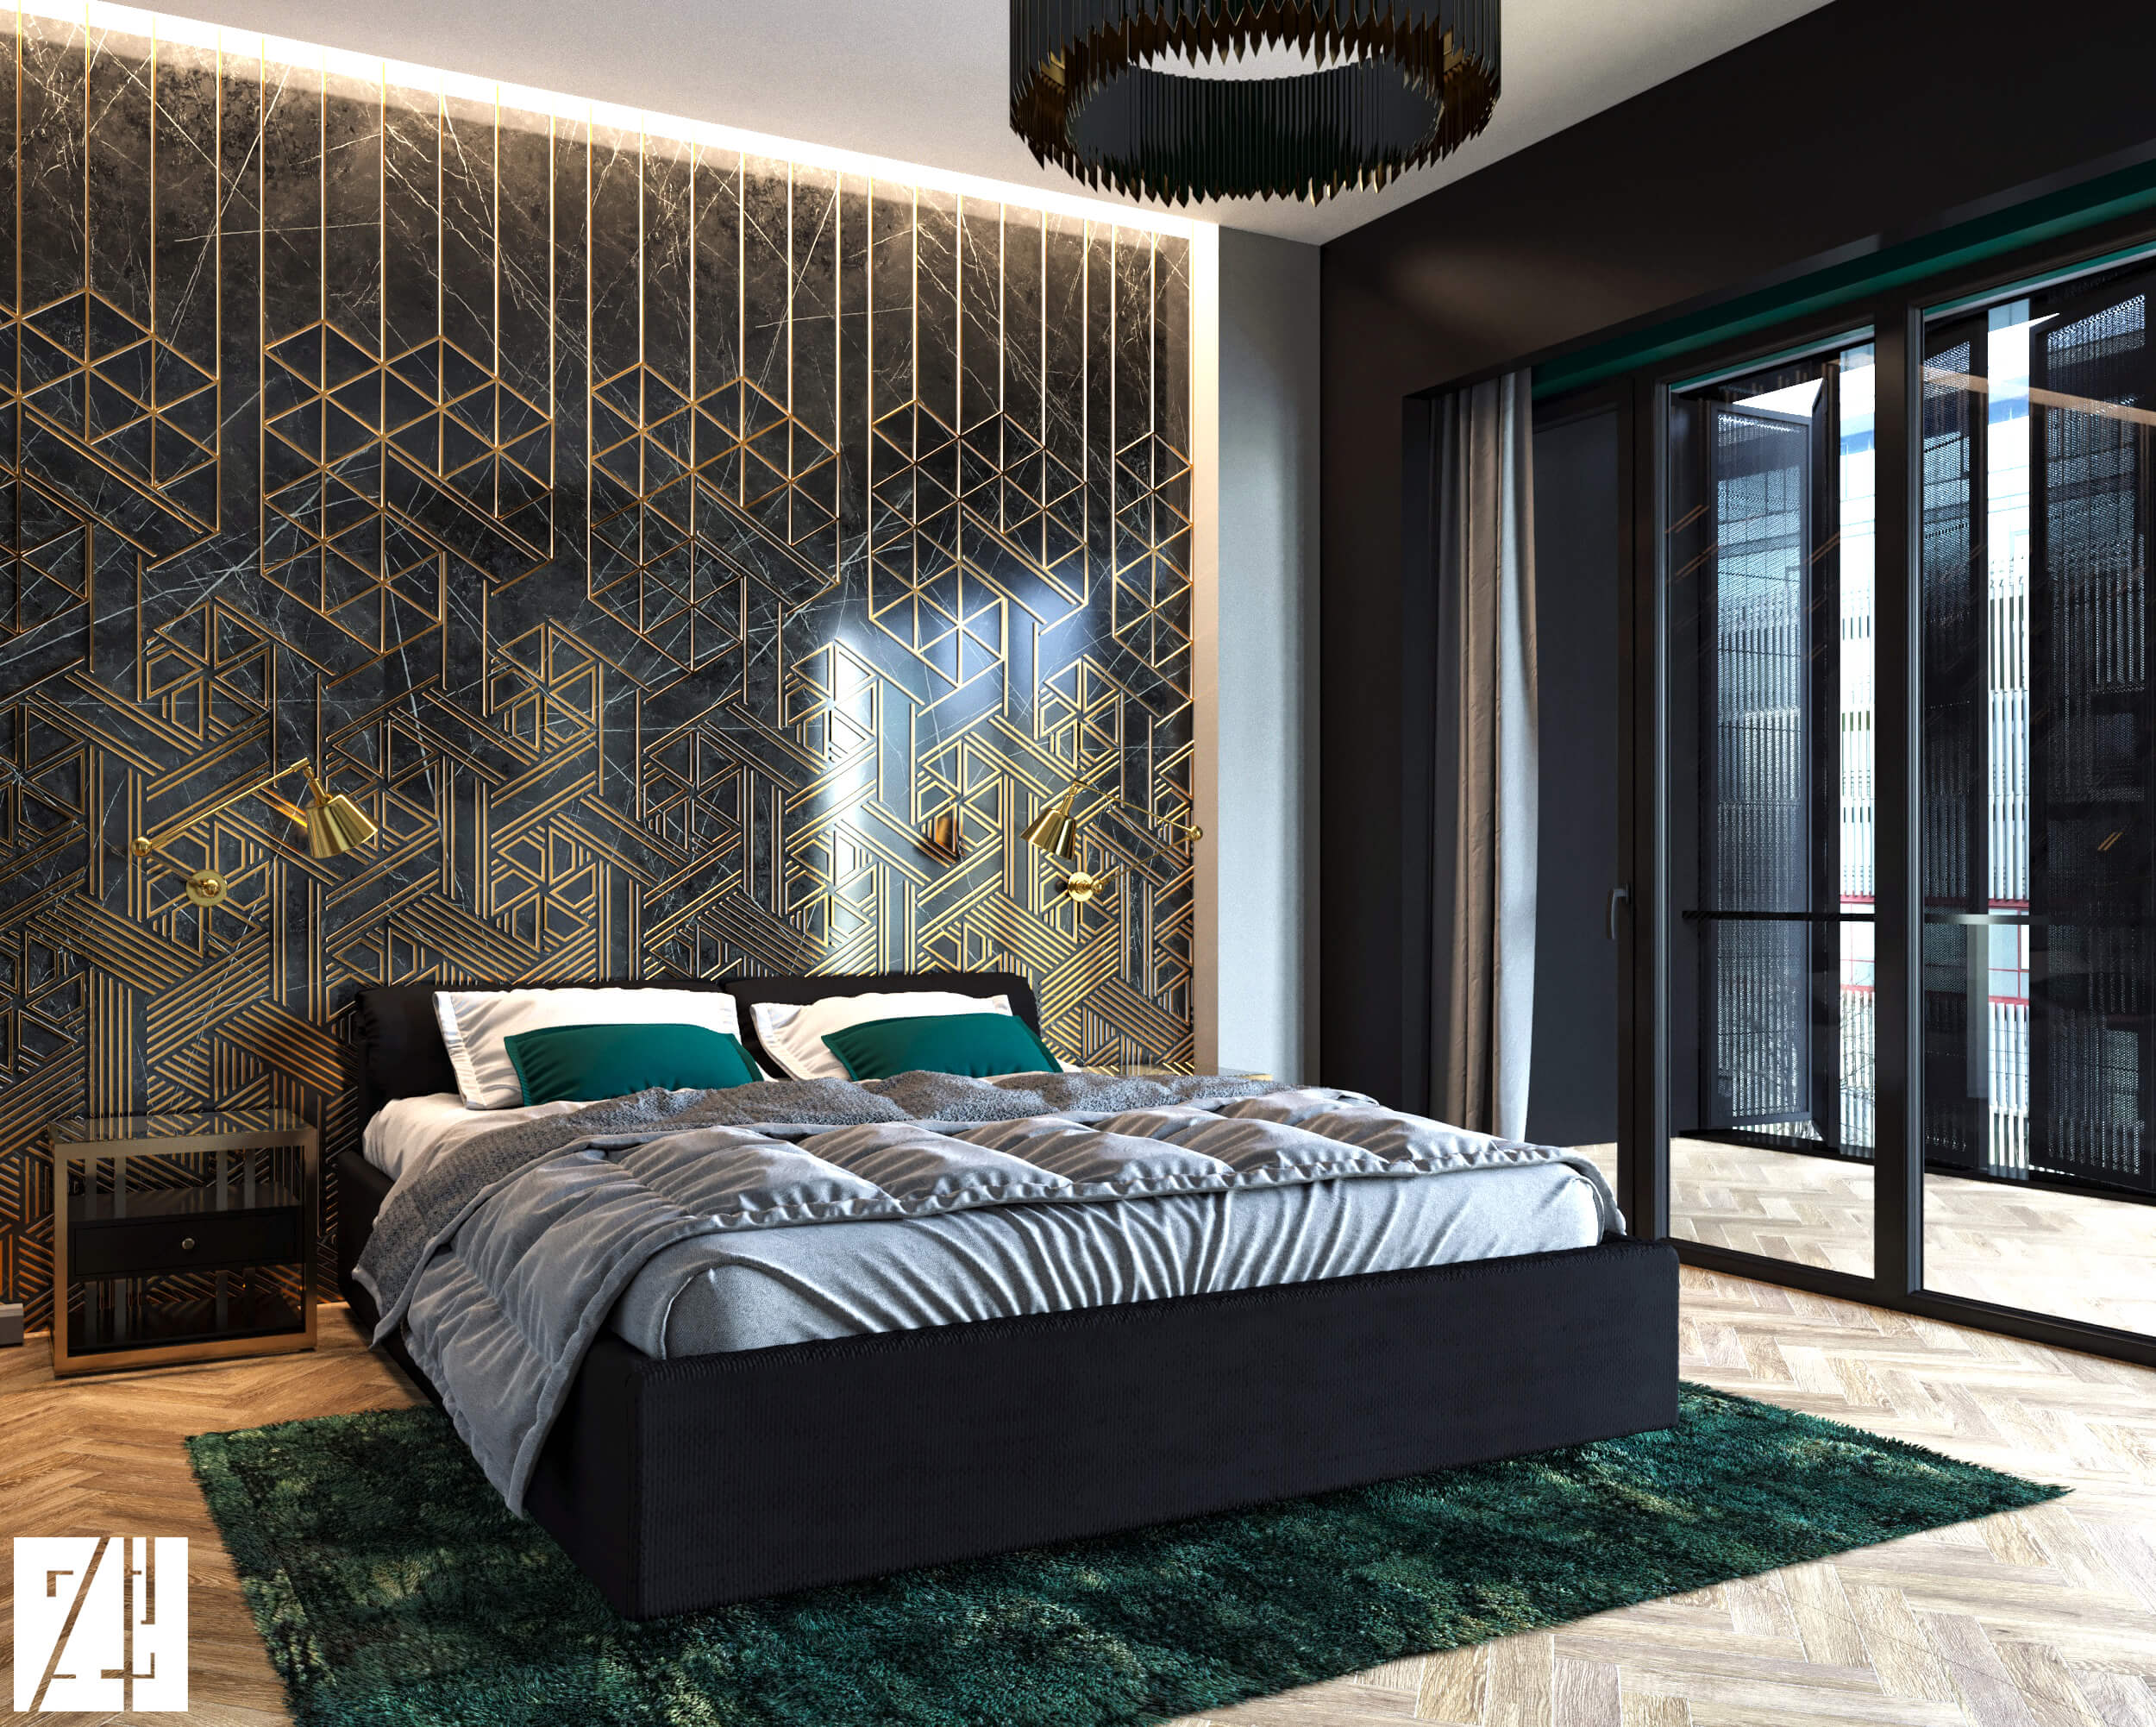 14_DI_CAMERA HOTEL + LOBBY (1)